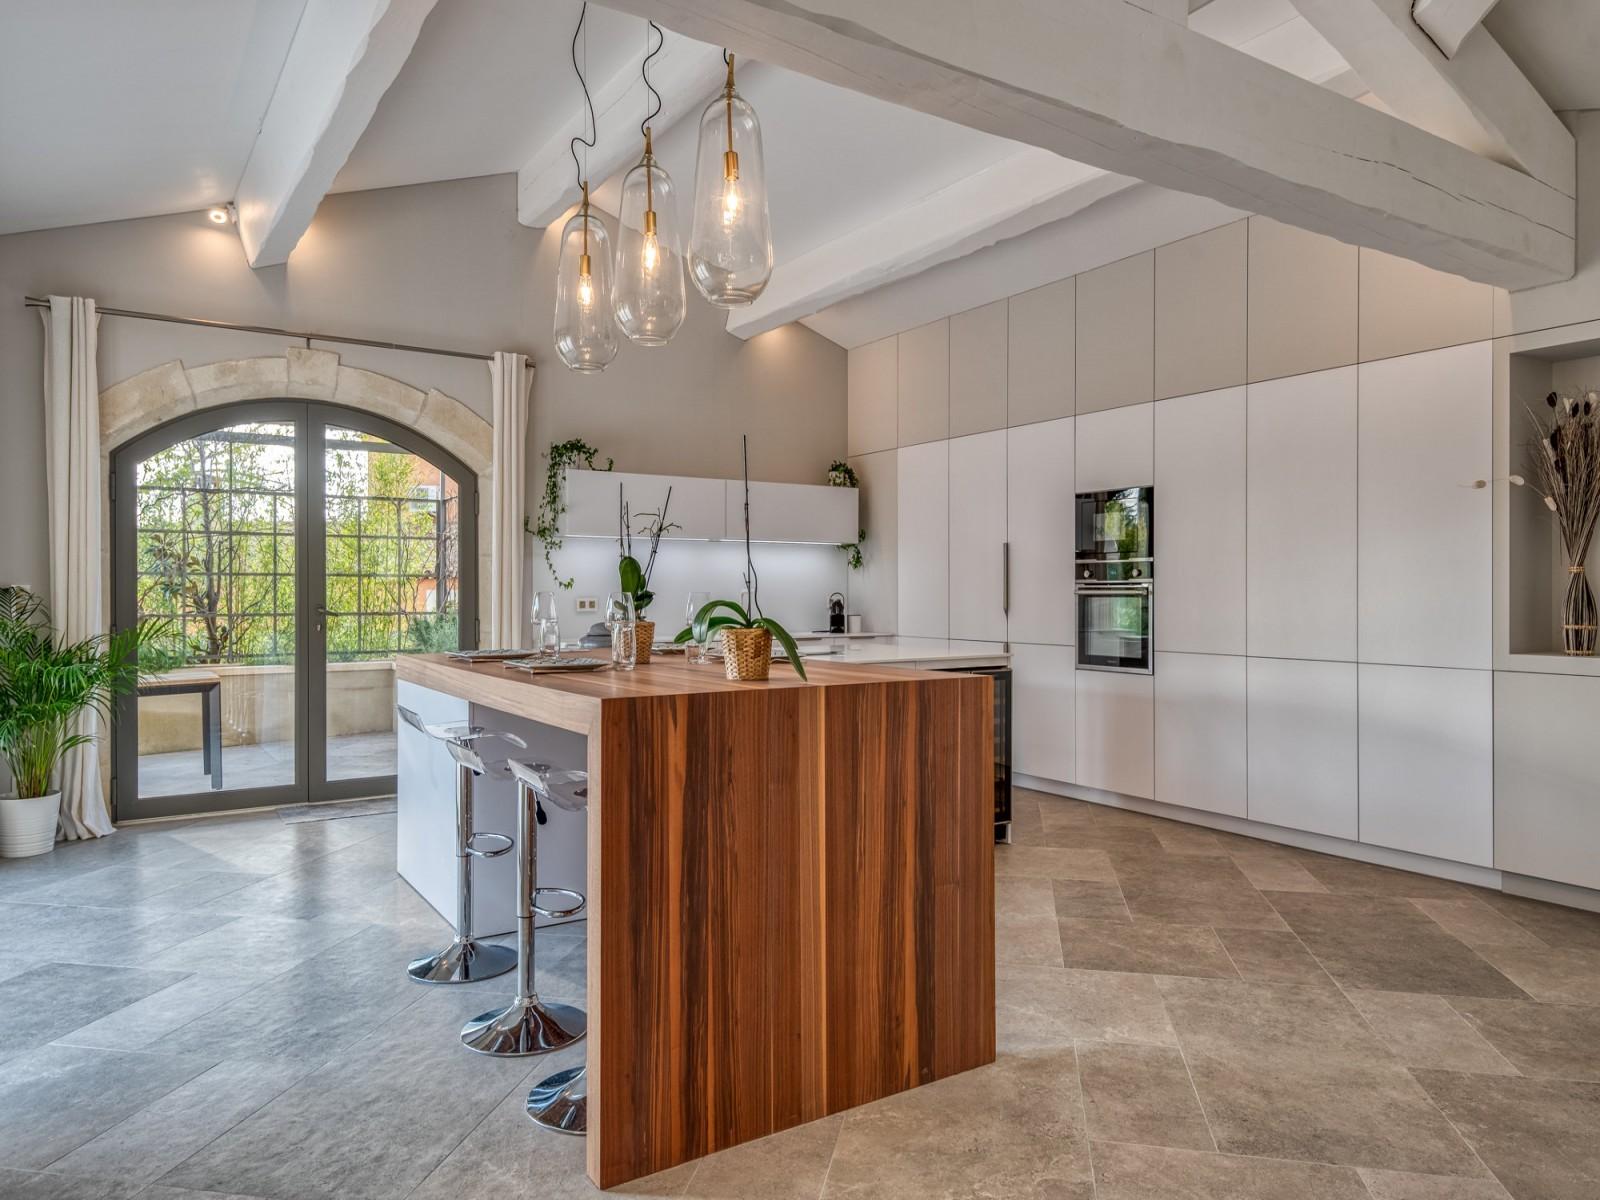 Saint Rémy De Provence Luxury Rental Villa Murcasite Kitchen